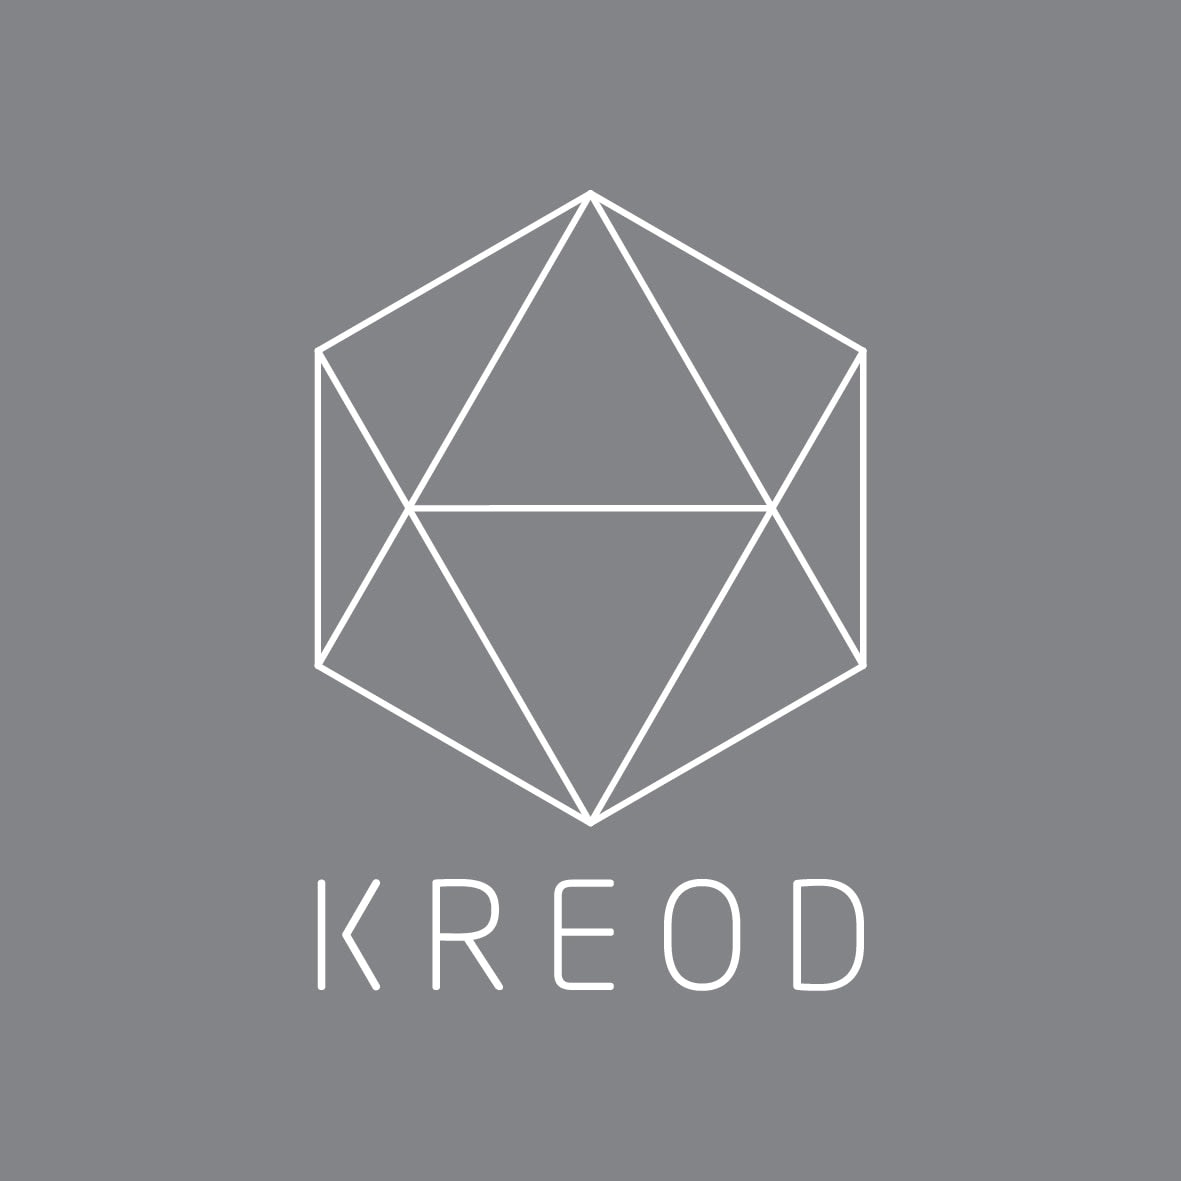 Kreod Architecture Ltd - London, London NW8 8PL - 020 8123 6788   ShowMeLocal.com